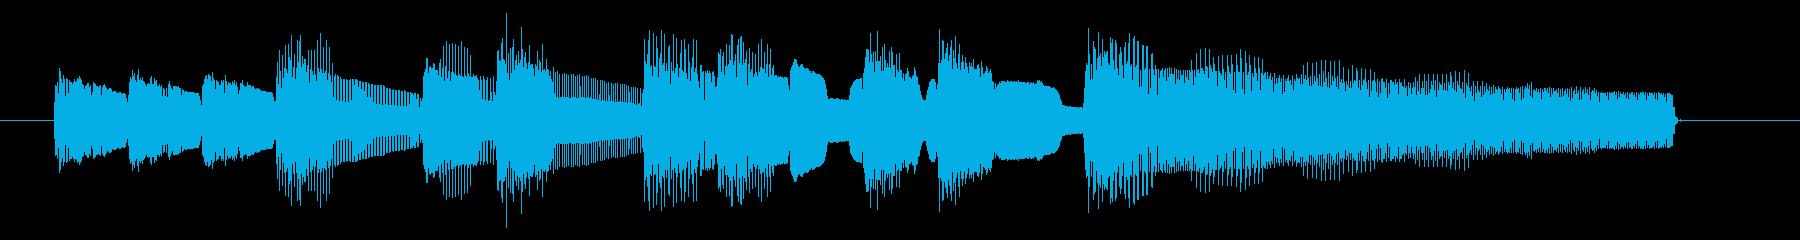 NES アクションD09-2(クリア2)の再生済みの波形